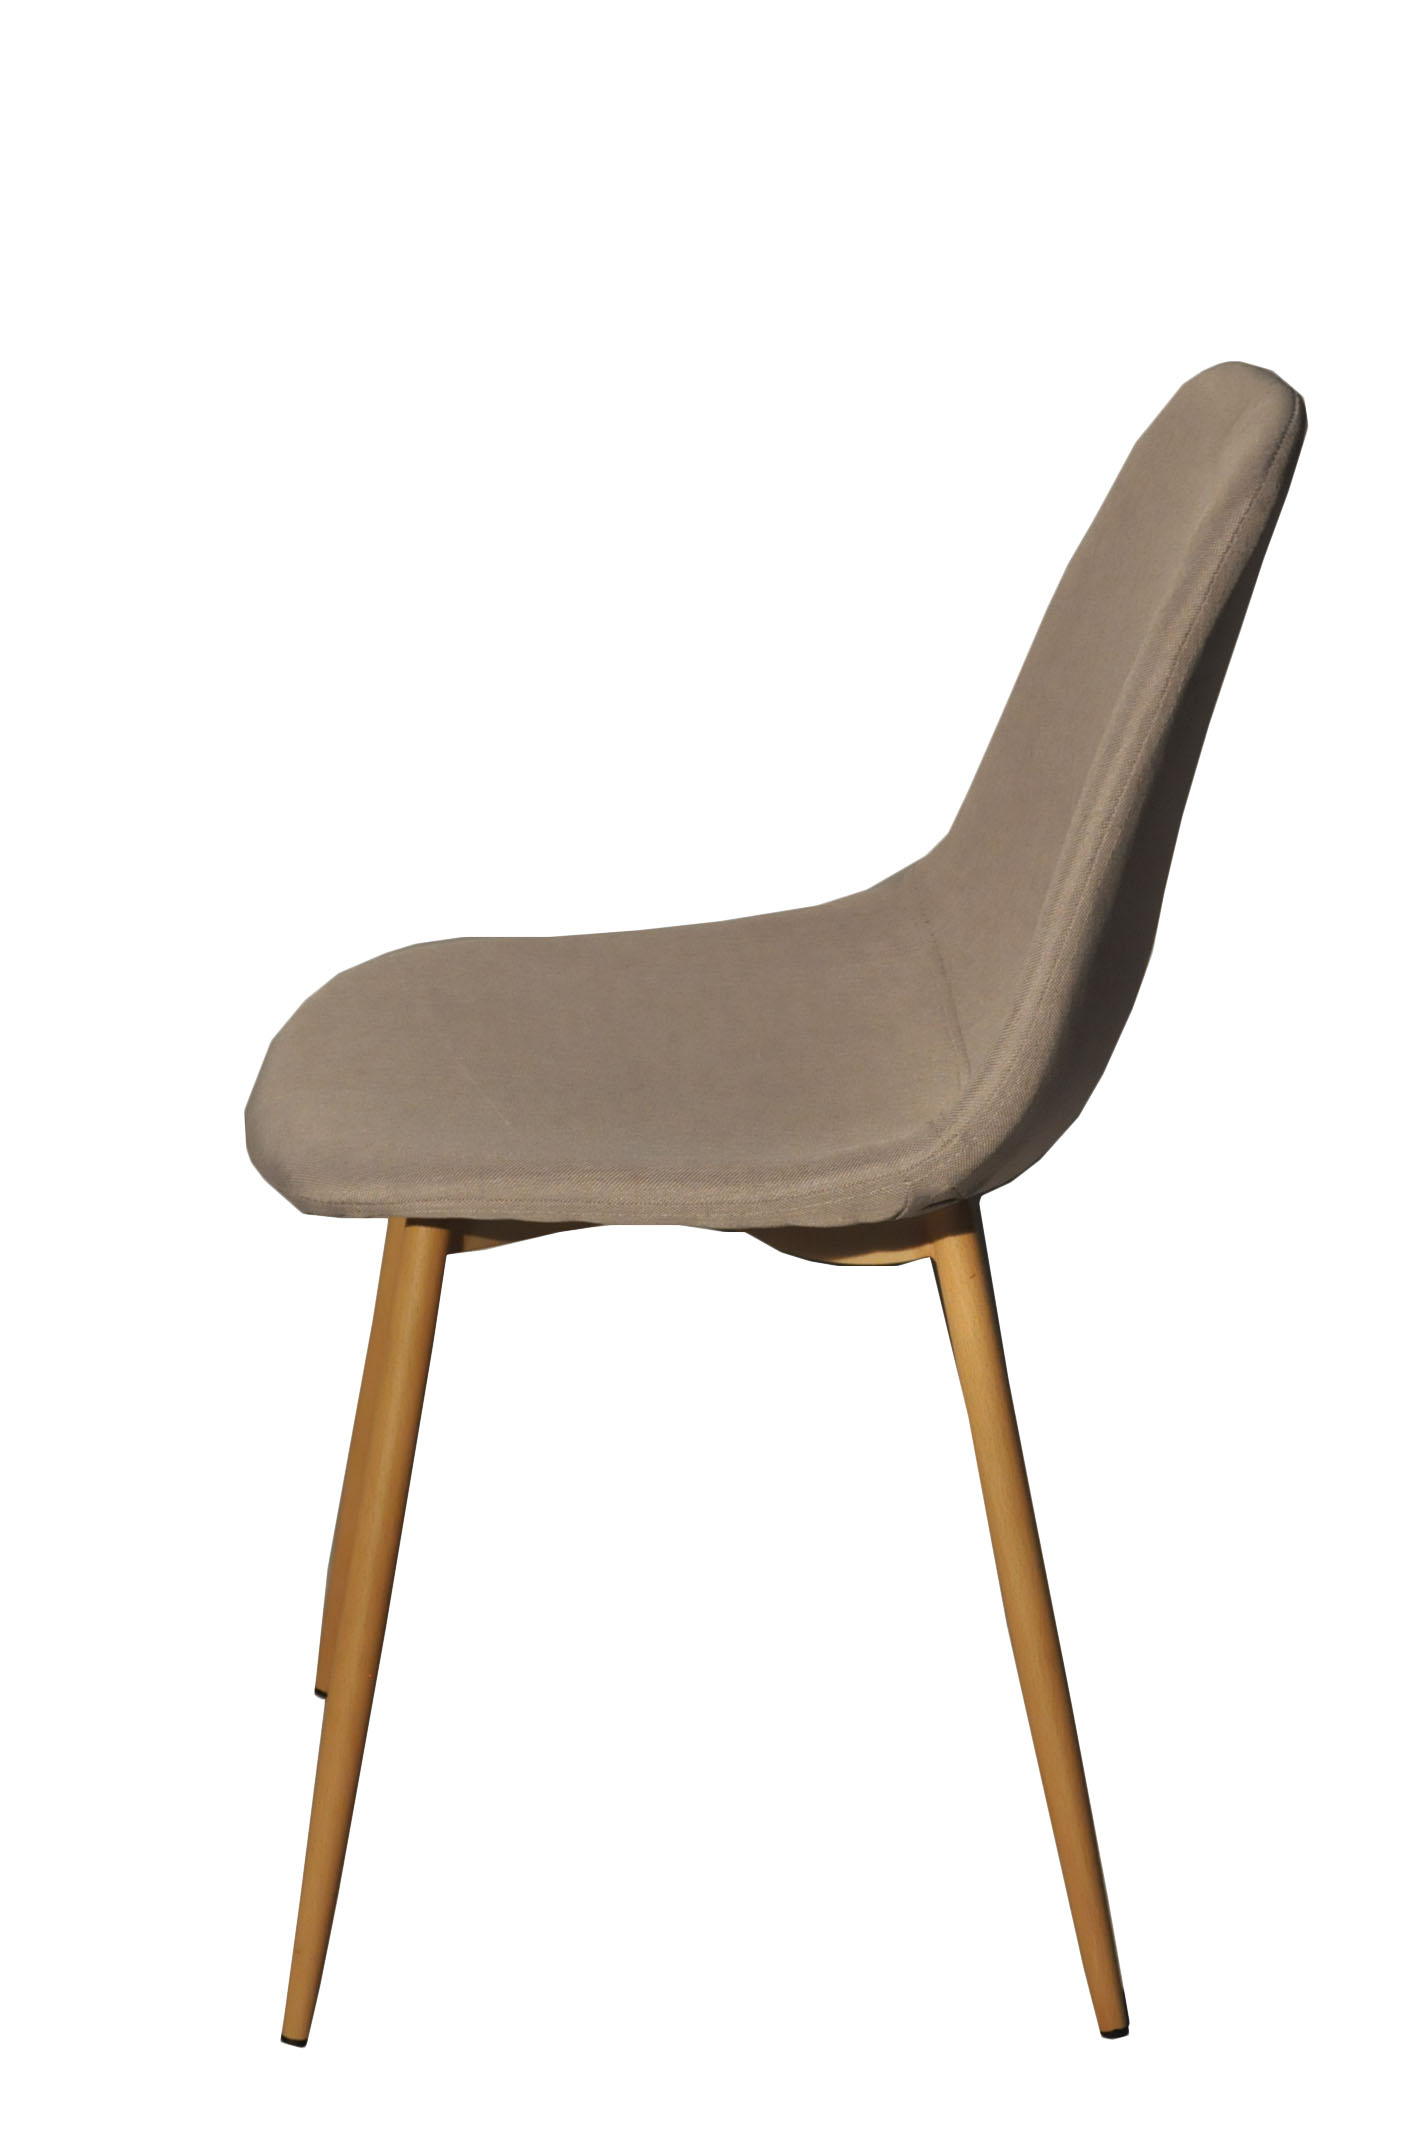 chaise design m tal style scandinave vanka demeure et jardin. Black Bedroom Furniture Sets. Home Design Ideas